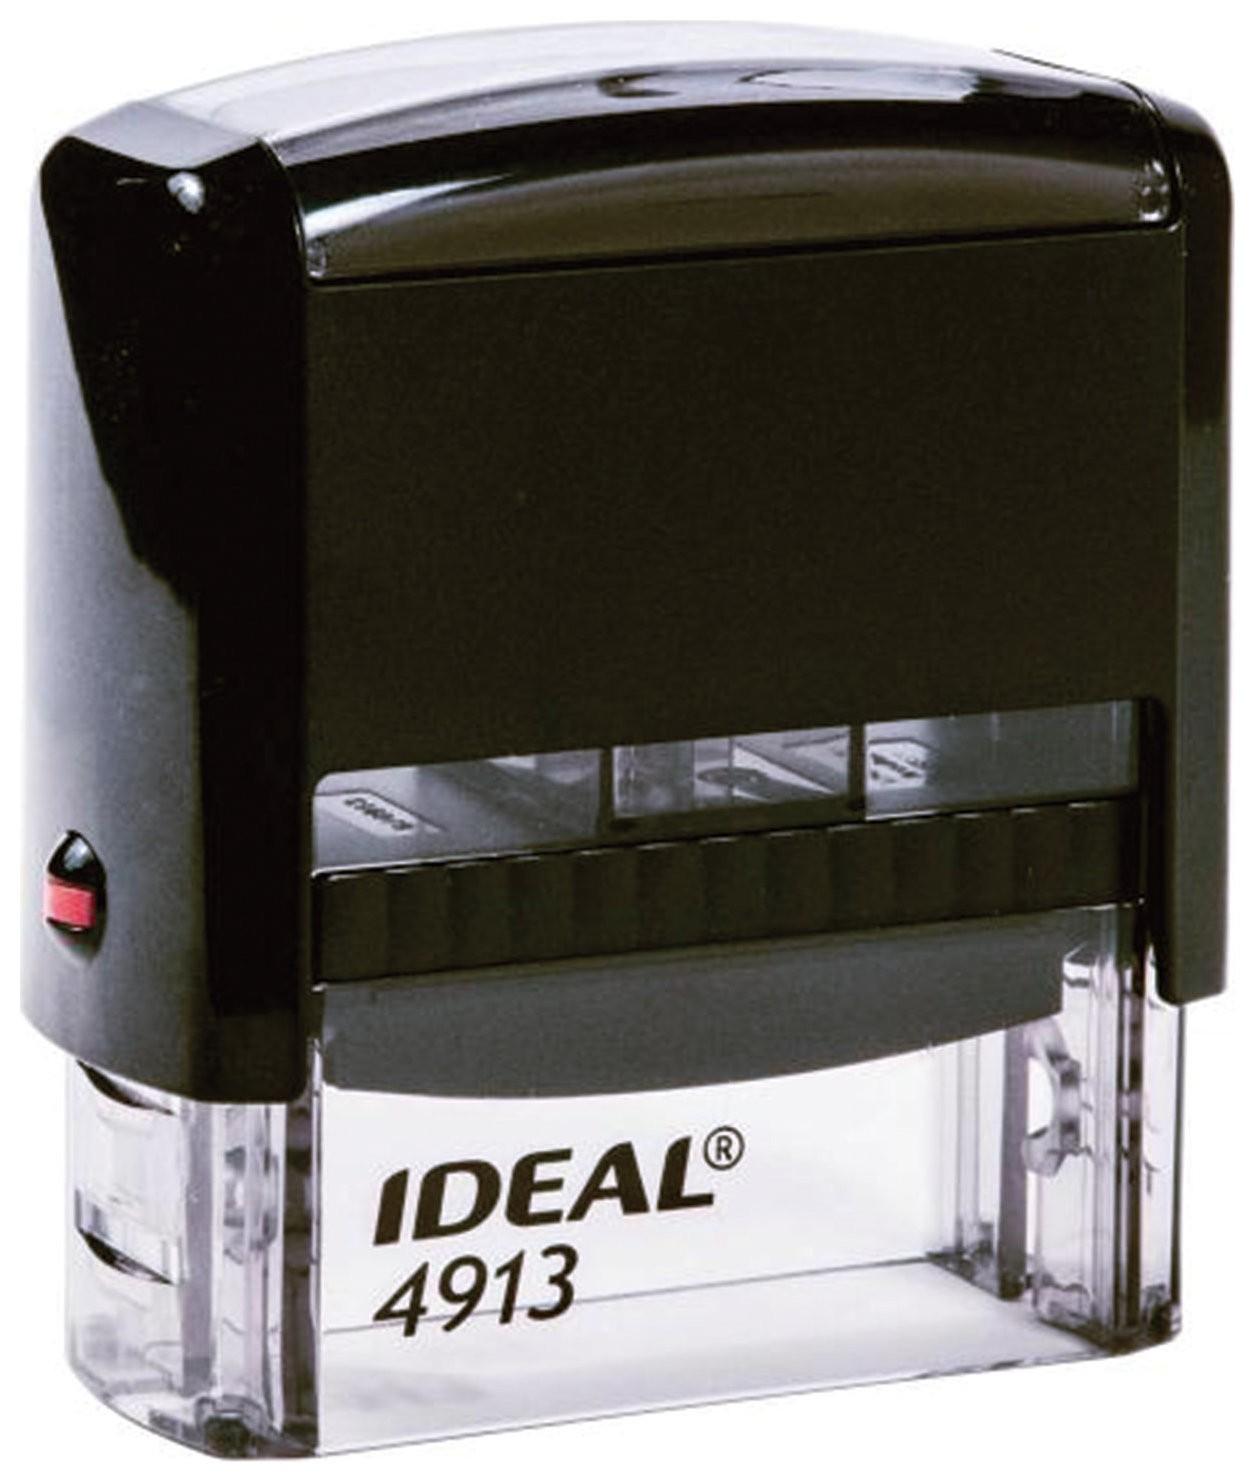 Оснастка для штампа, размер оттиска 58х22 мм, синий, Trodat Ideal 4913 P2, подушка в комплекте  Trodat